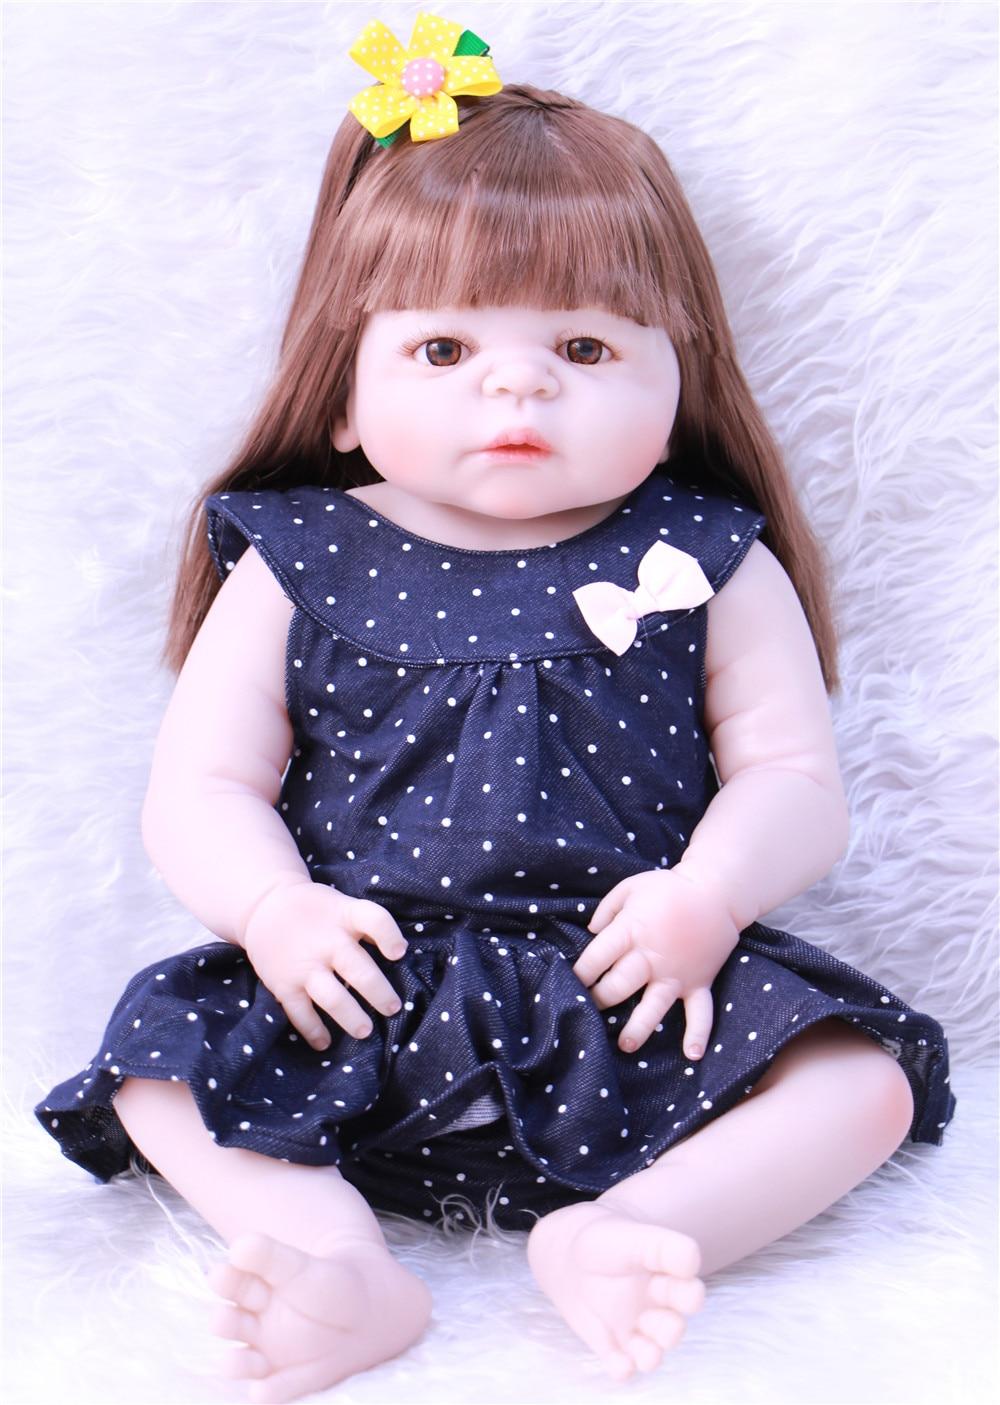 55 cm Tubuh Penuh Silikon Reborn Boneka Bayi perempuan Mainan 22 inch baru  lahir Putri Balita Bayi Dolls Mandi Toy Bermain Rumah Mainan bonecas di  Boneka ... 31cbacf1d1